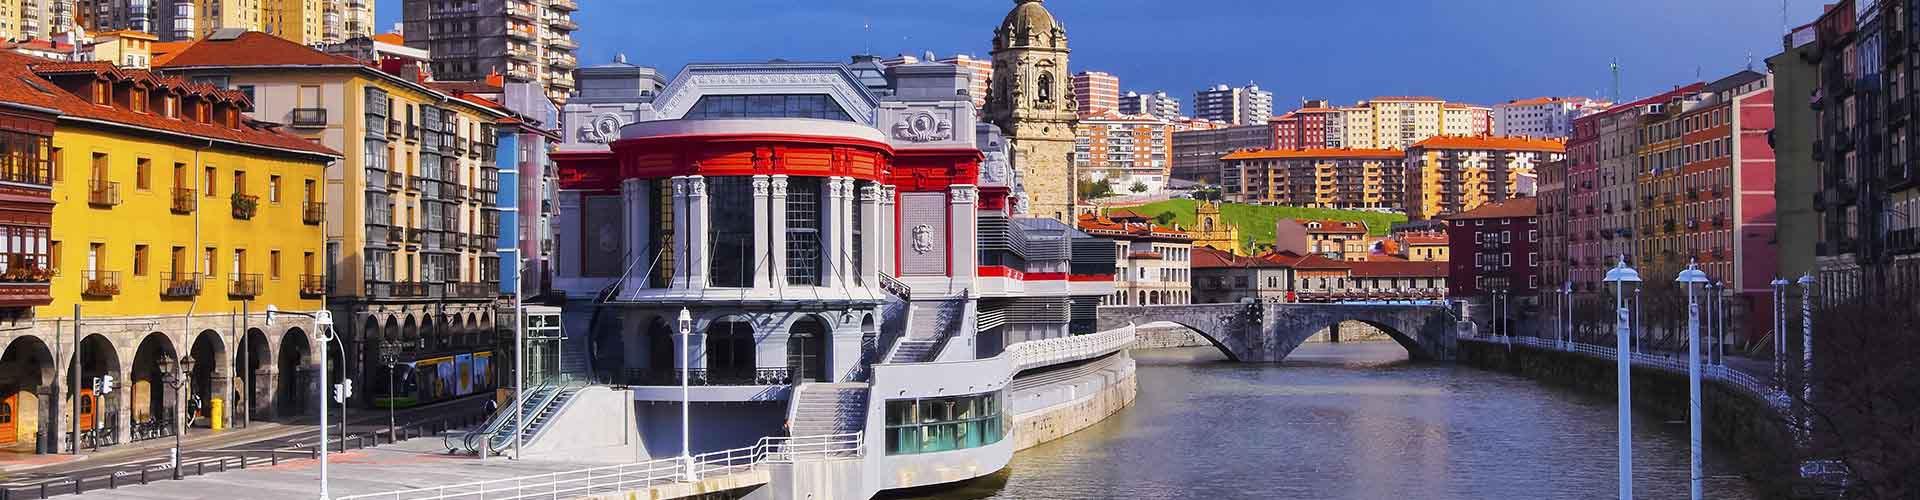 Bilbao - Albergues Juveniles cerca a Estación de tren de Bilbao-Abando. Mapas de Bilbao, Fotos y Comentarios para cada Albergue Juvenil en Bilbao.